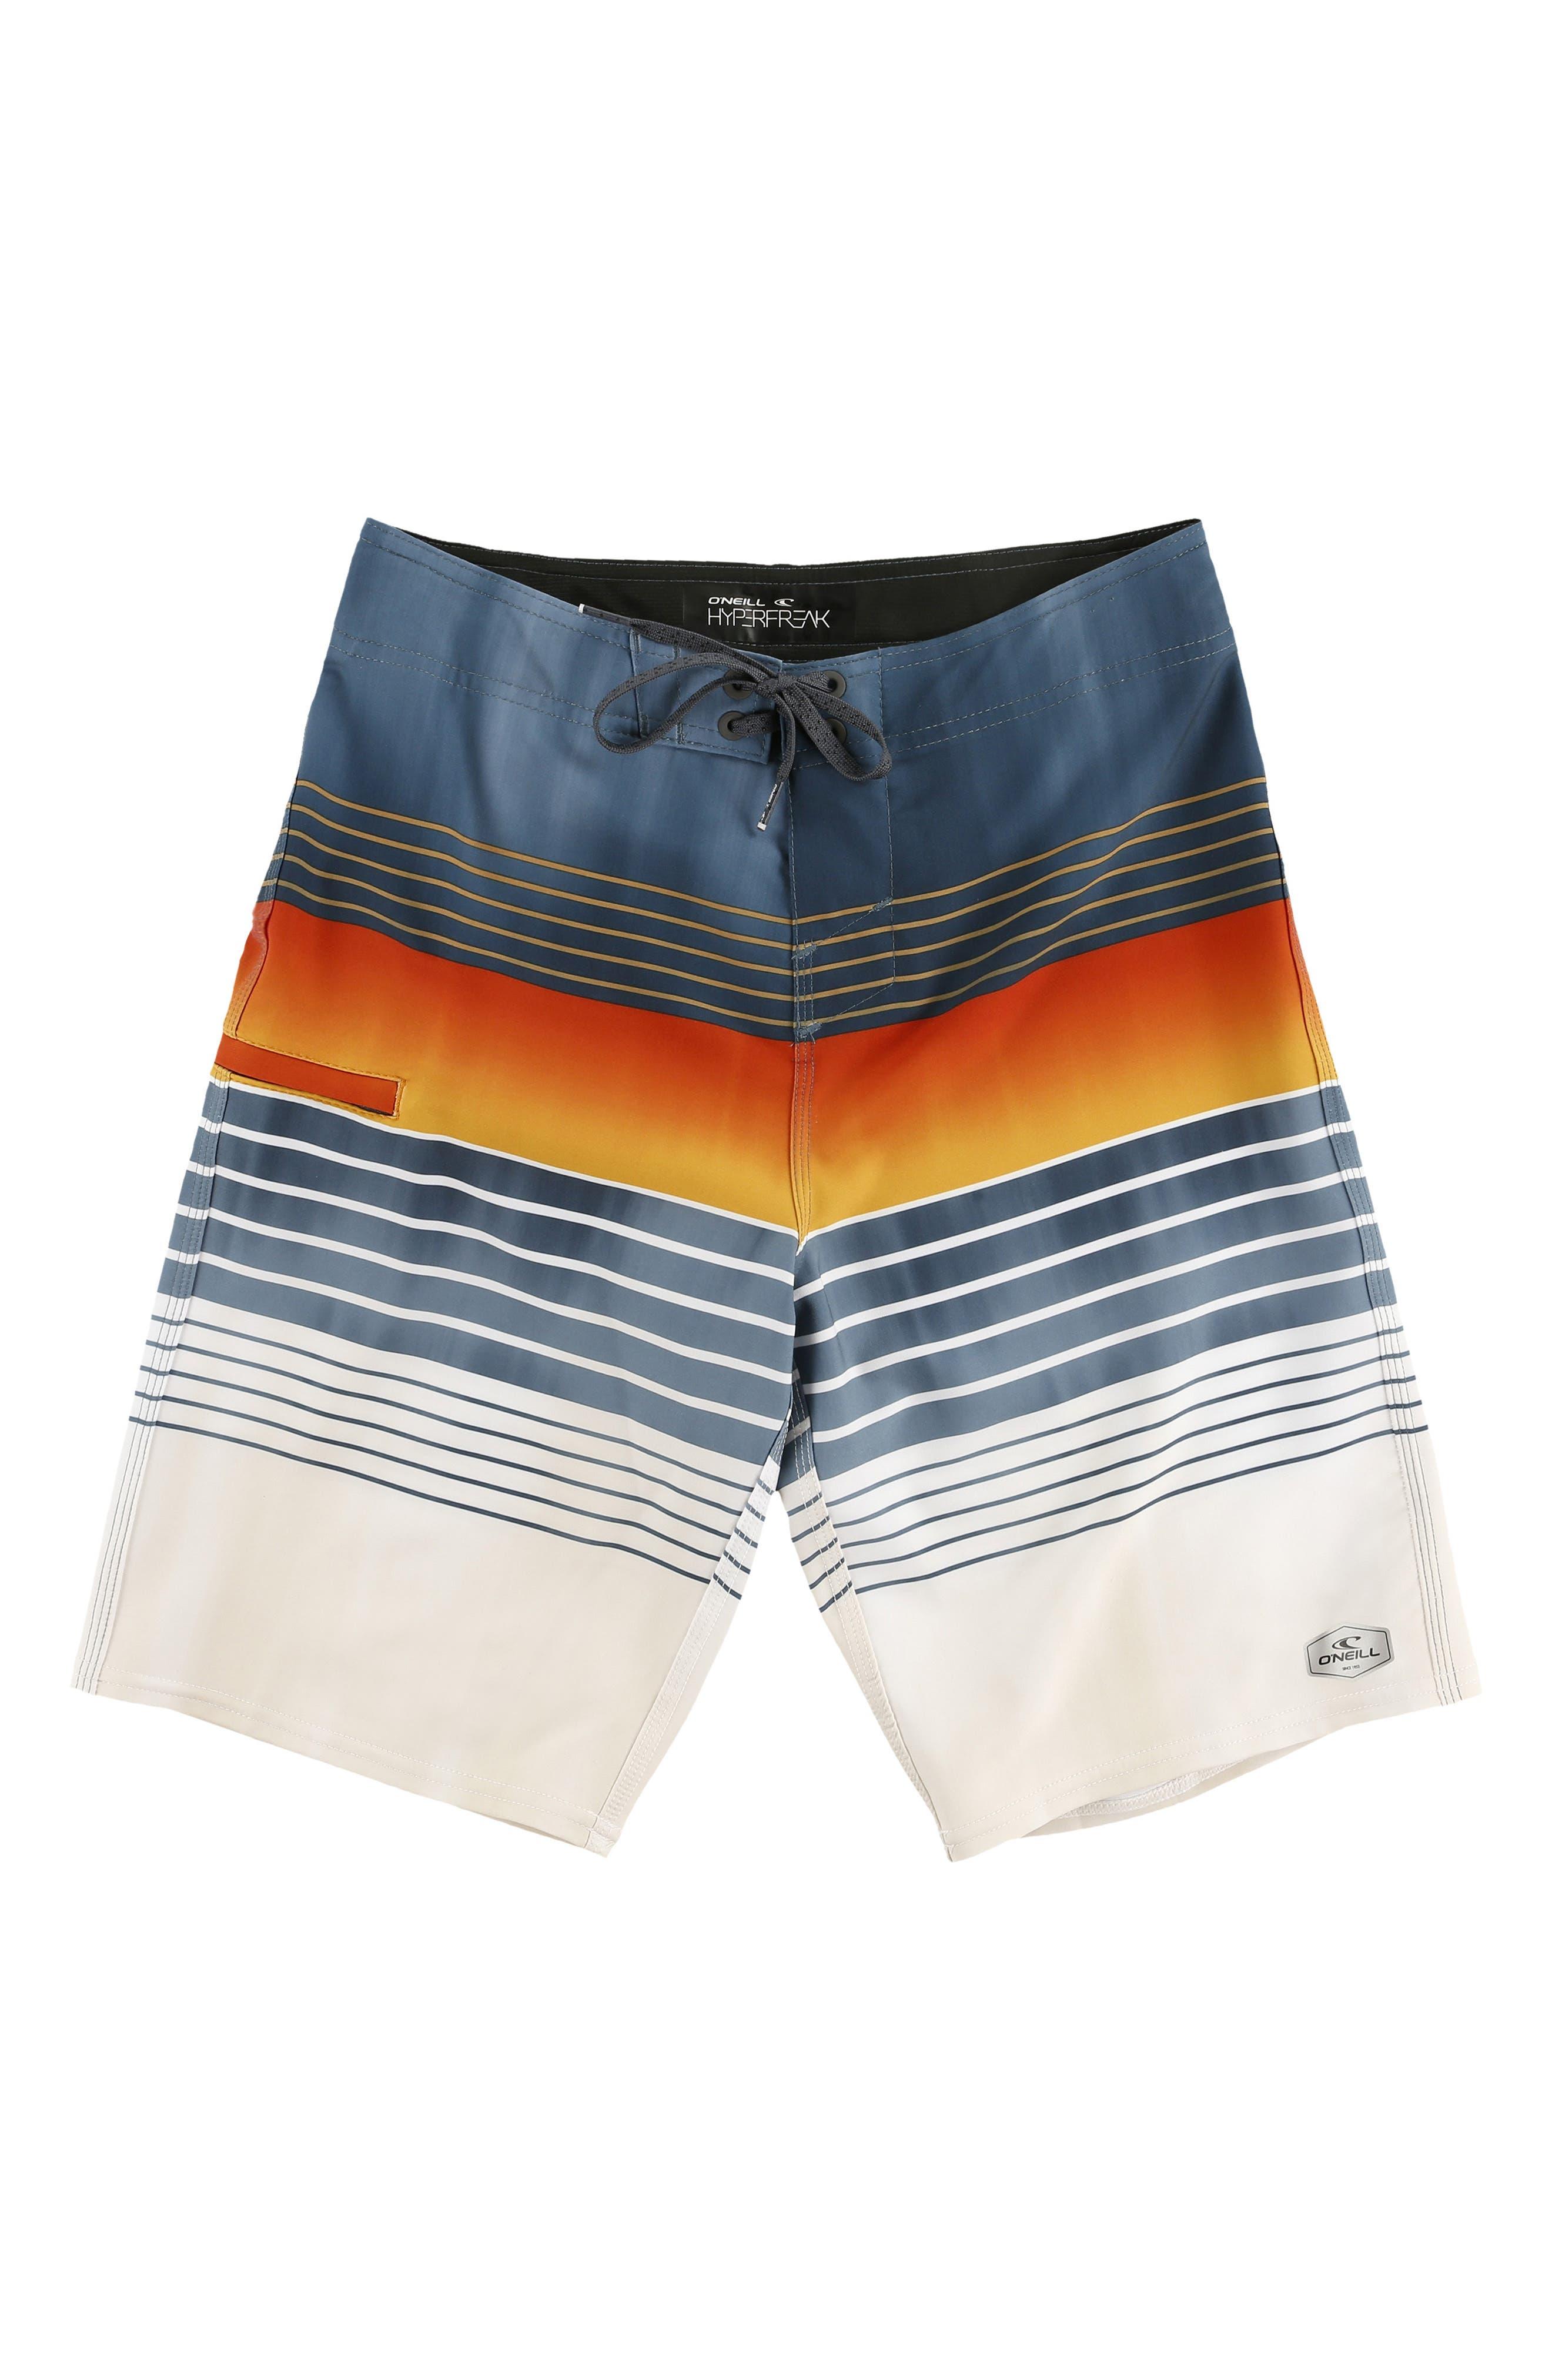 Hyperfreak Heist Board Shorts,                             Main thumbnail 1, color,                             DUST BLUE